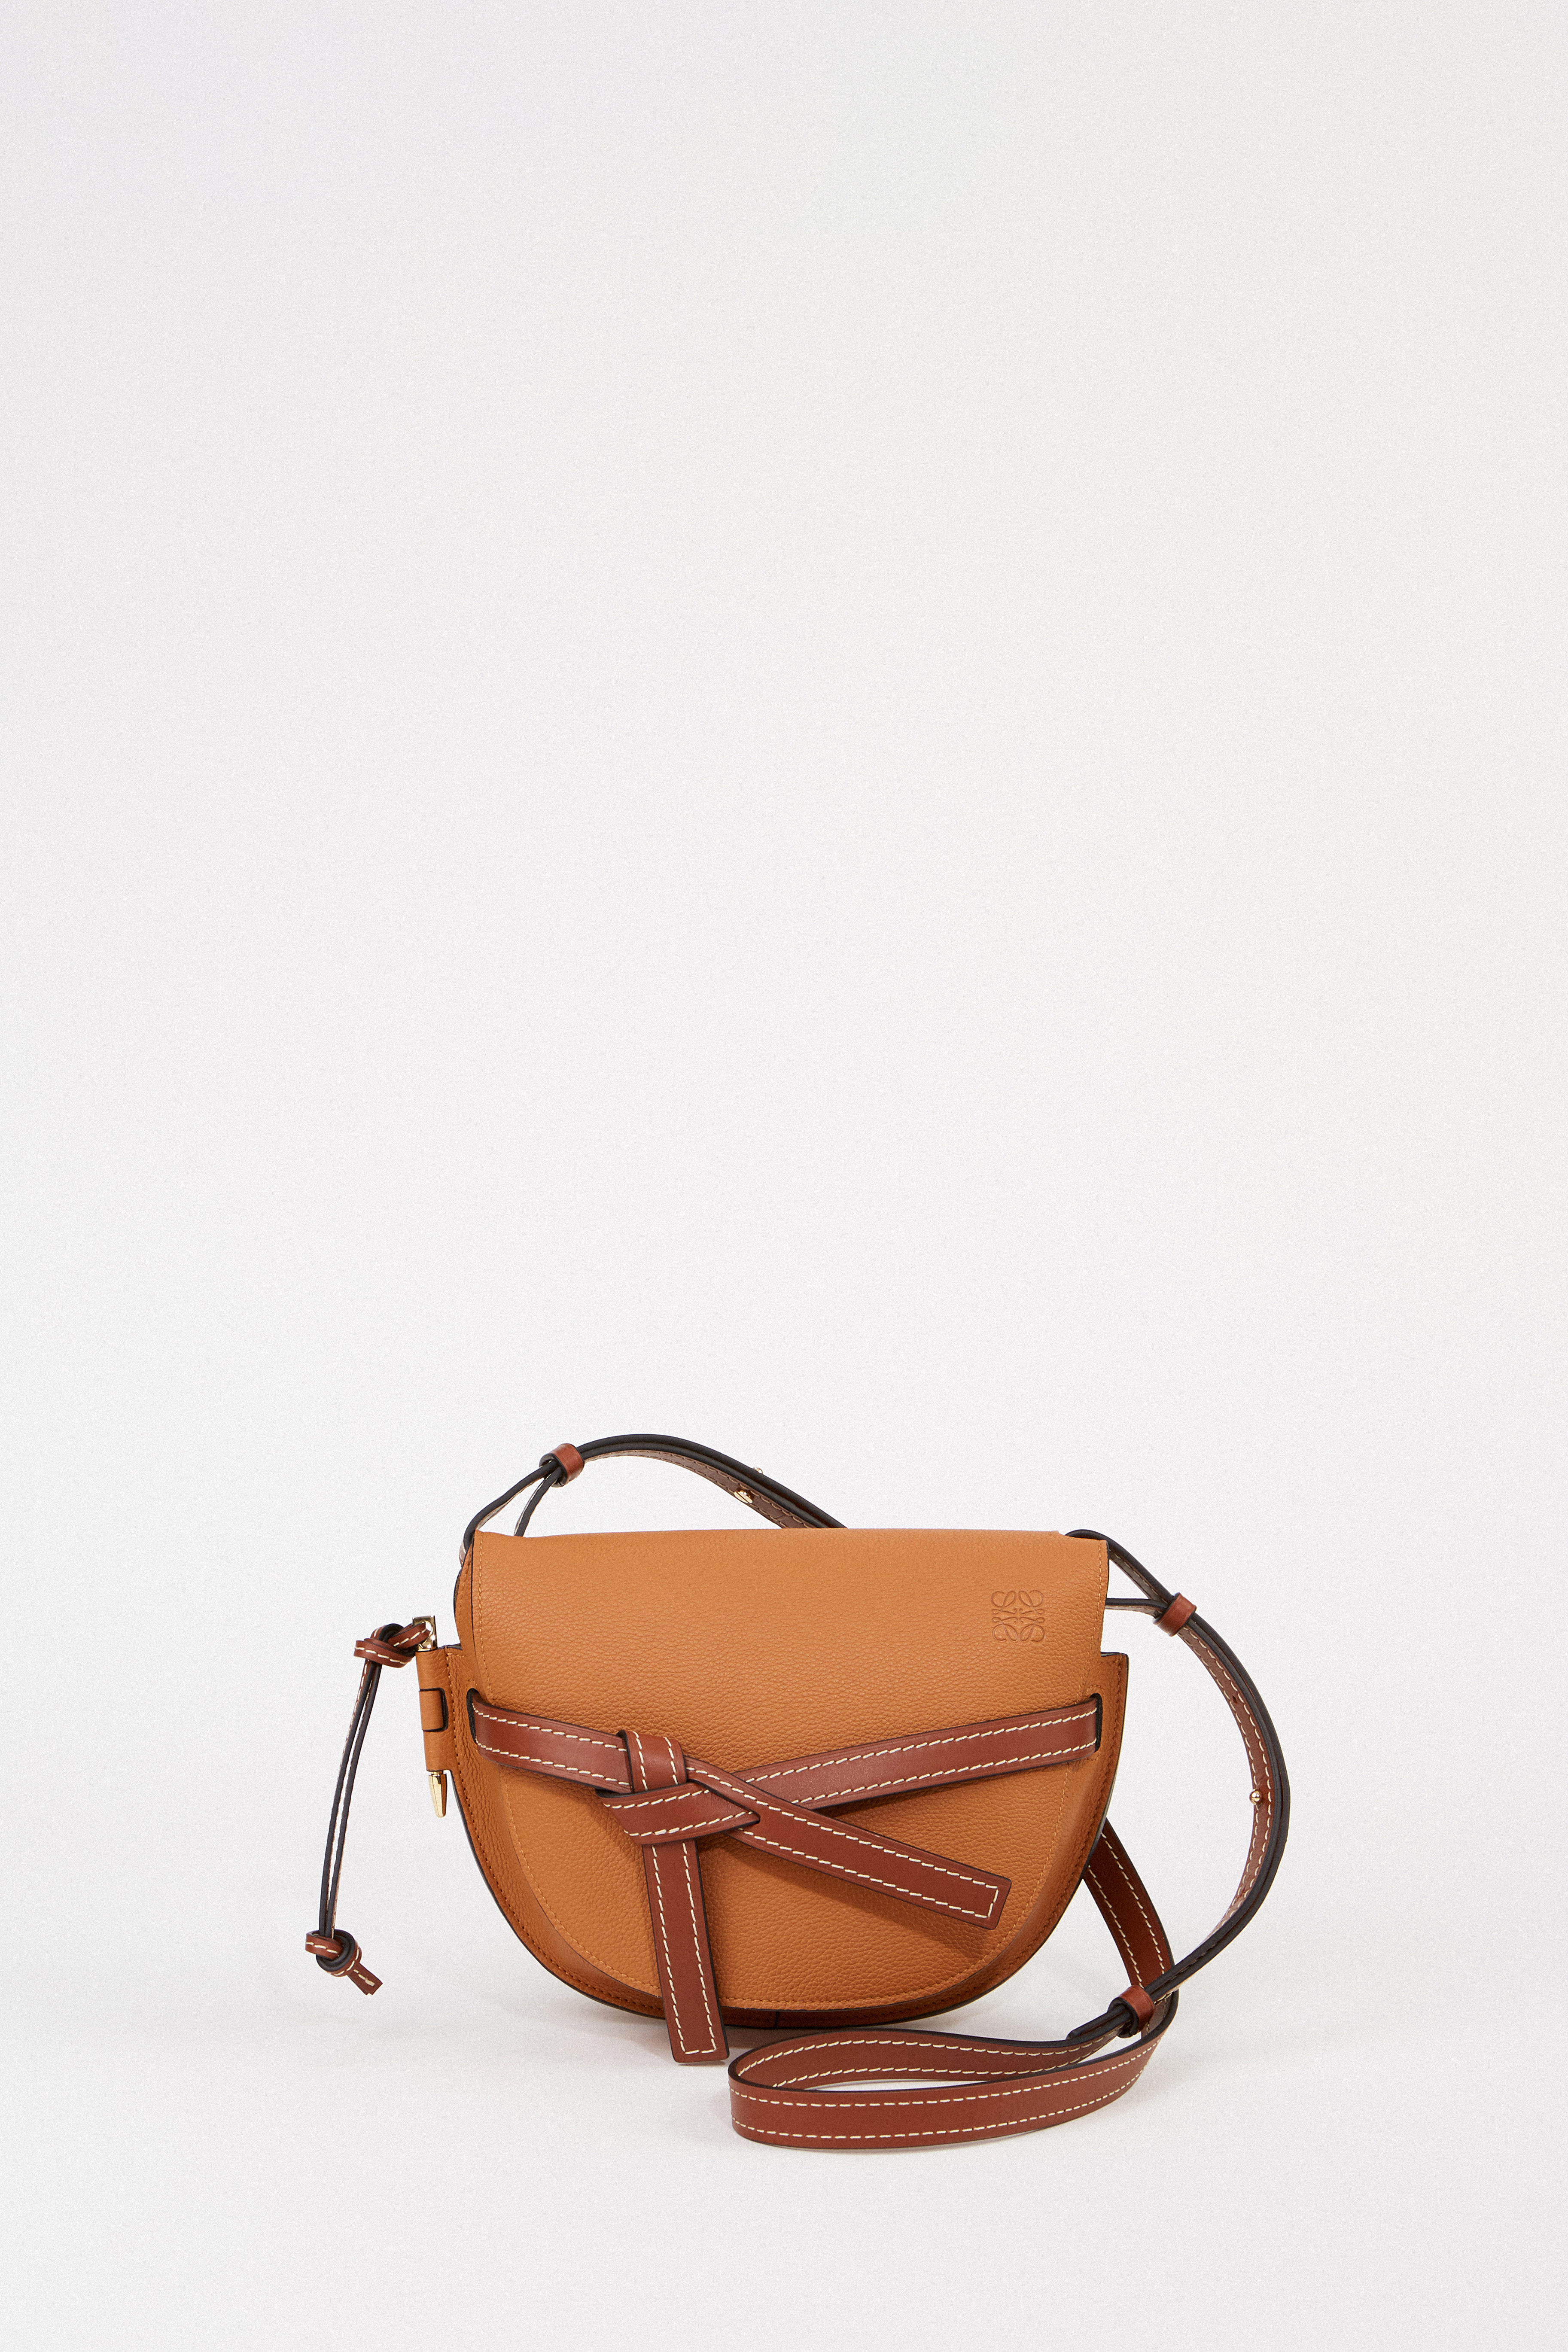 87a5a7aa598859 Umhängetaschen   Taschen   unger-fashion.com